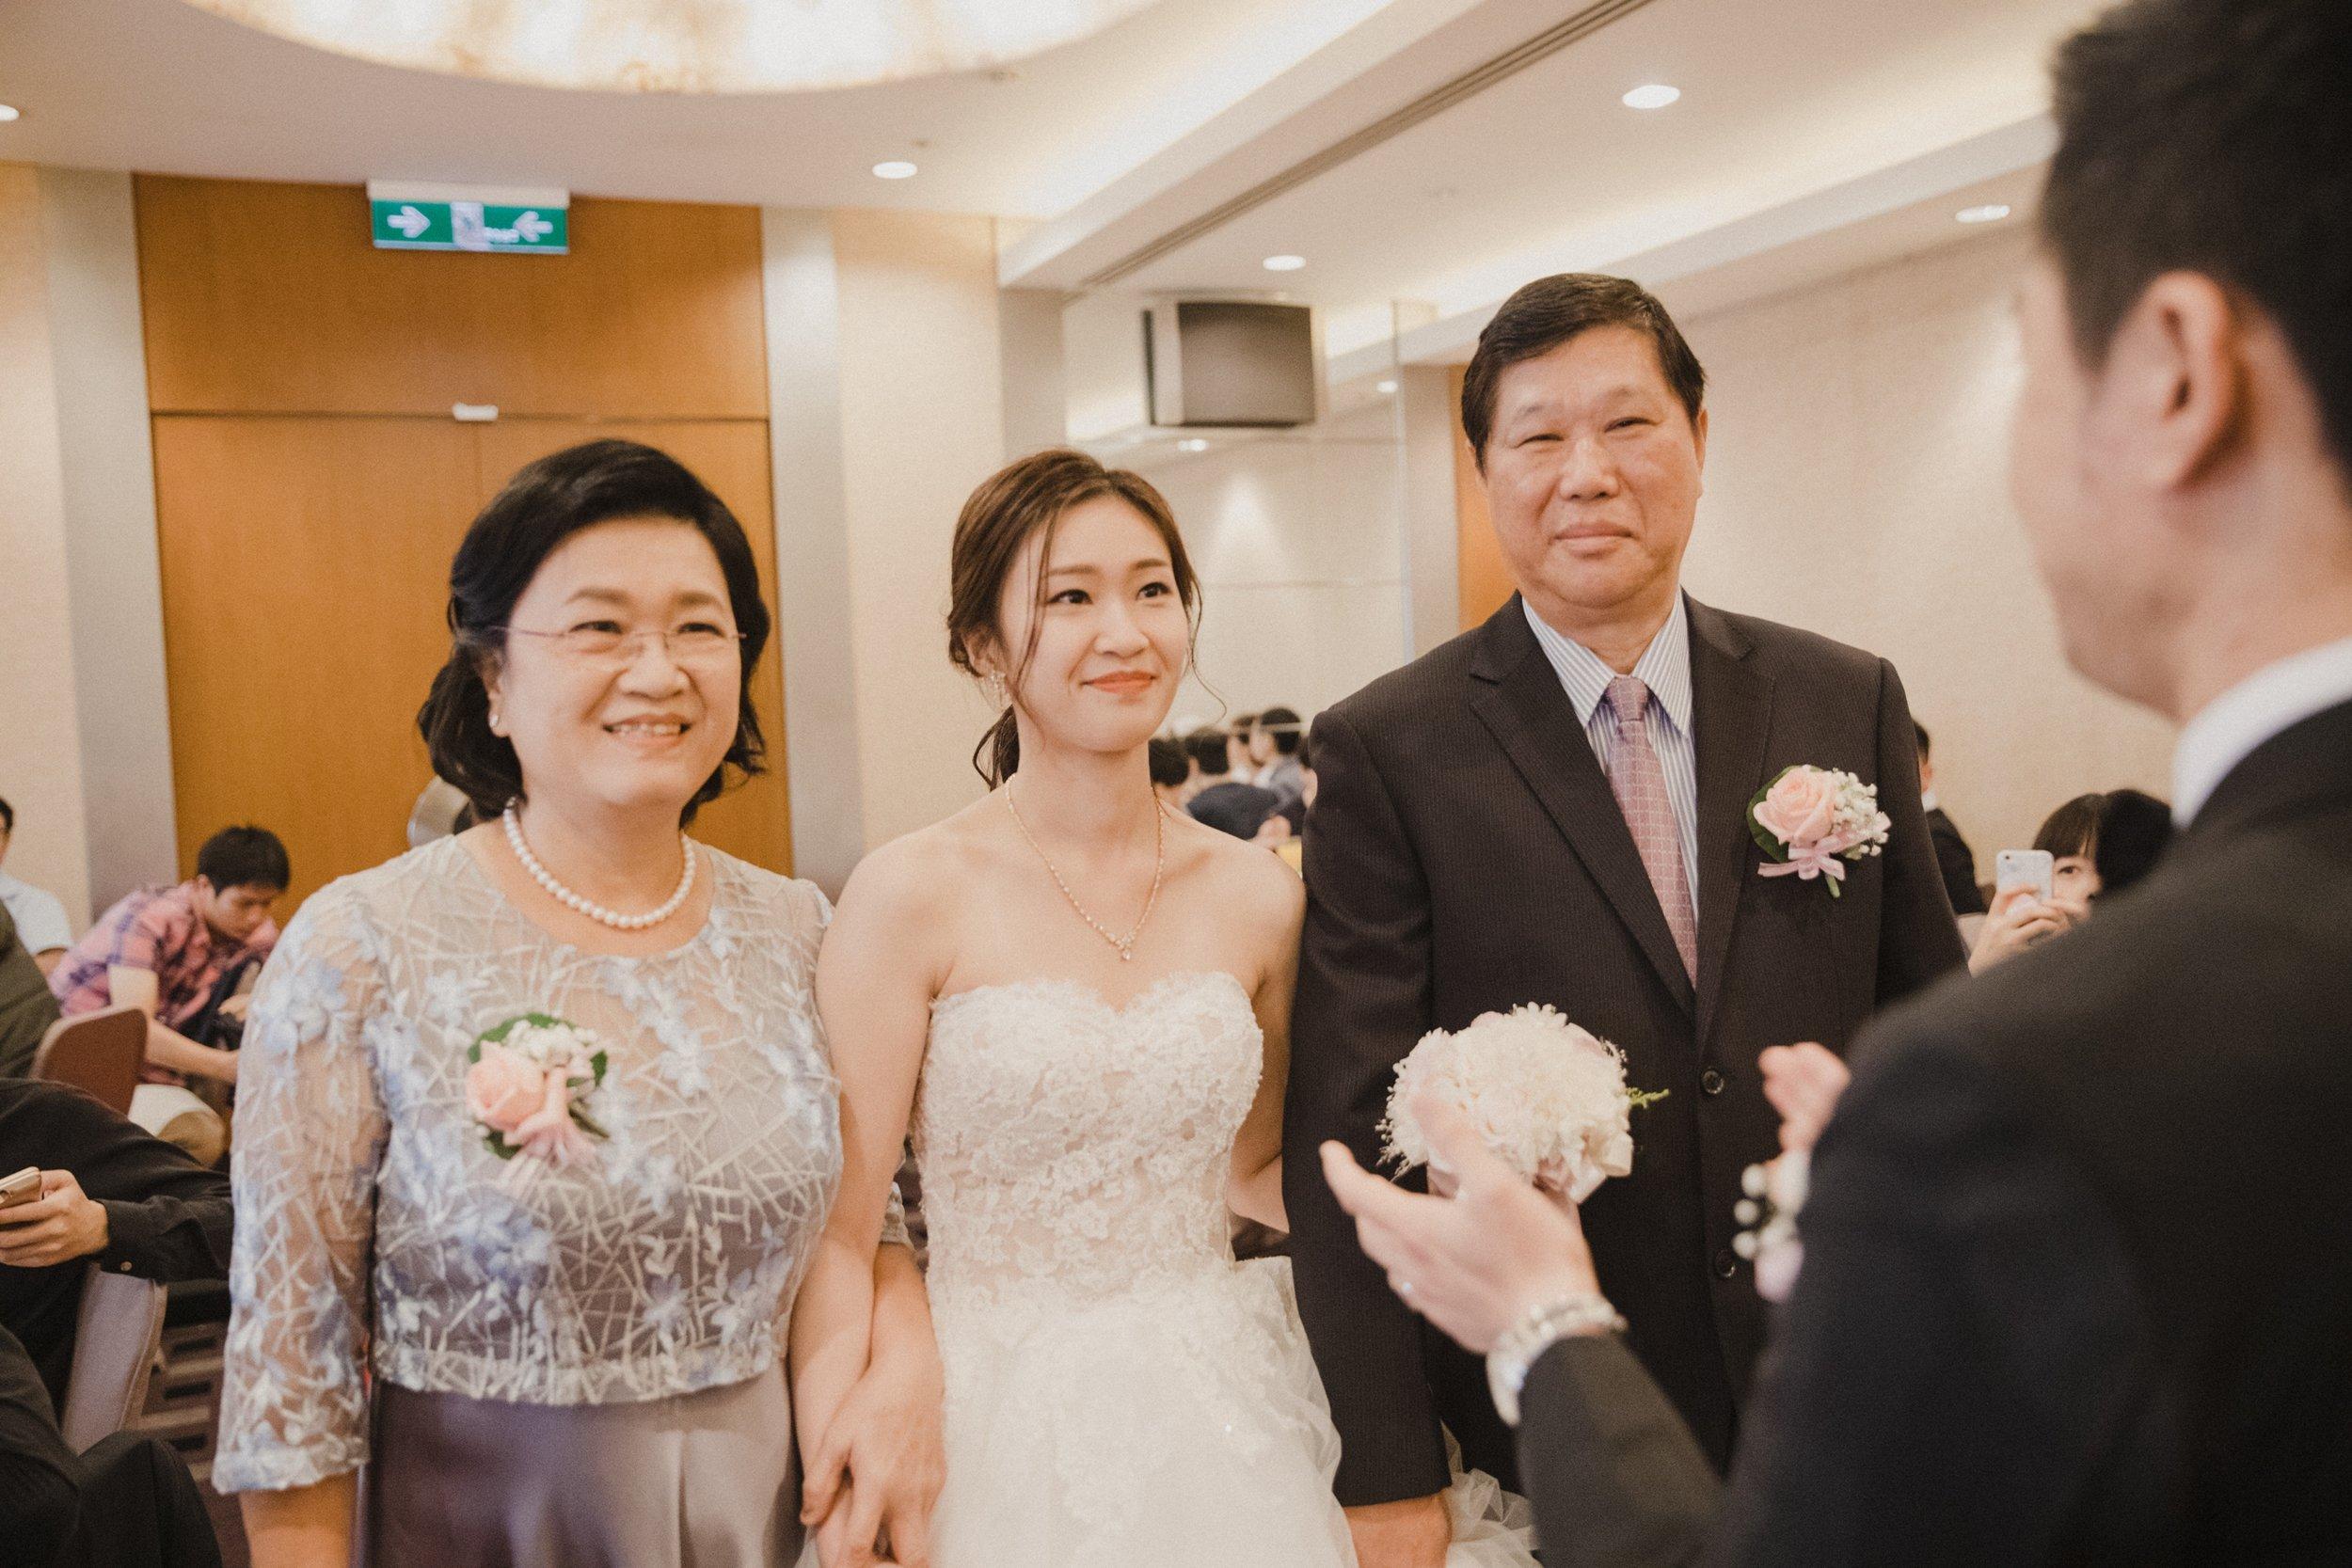 wedding-caridee-oscar-lunch-ambassador-hsinchu-結婚午宴-新竹國賓_65.jpg